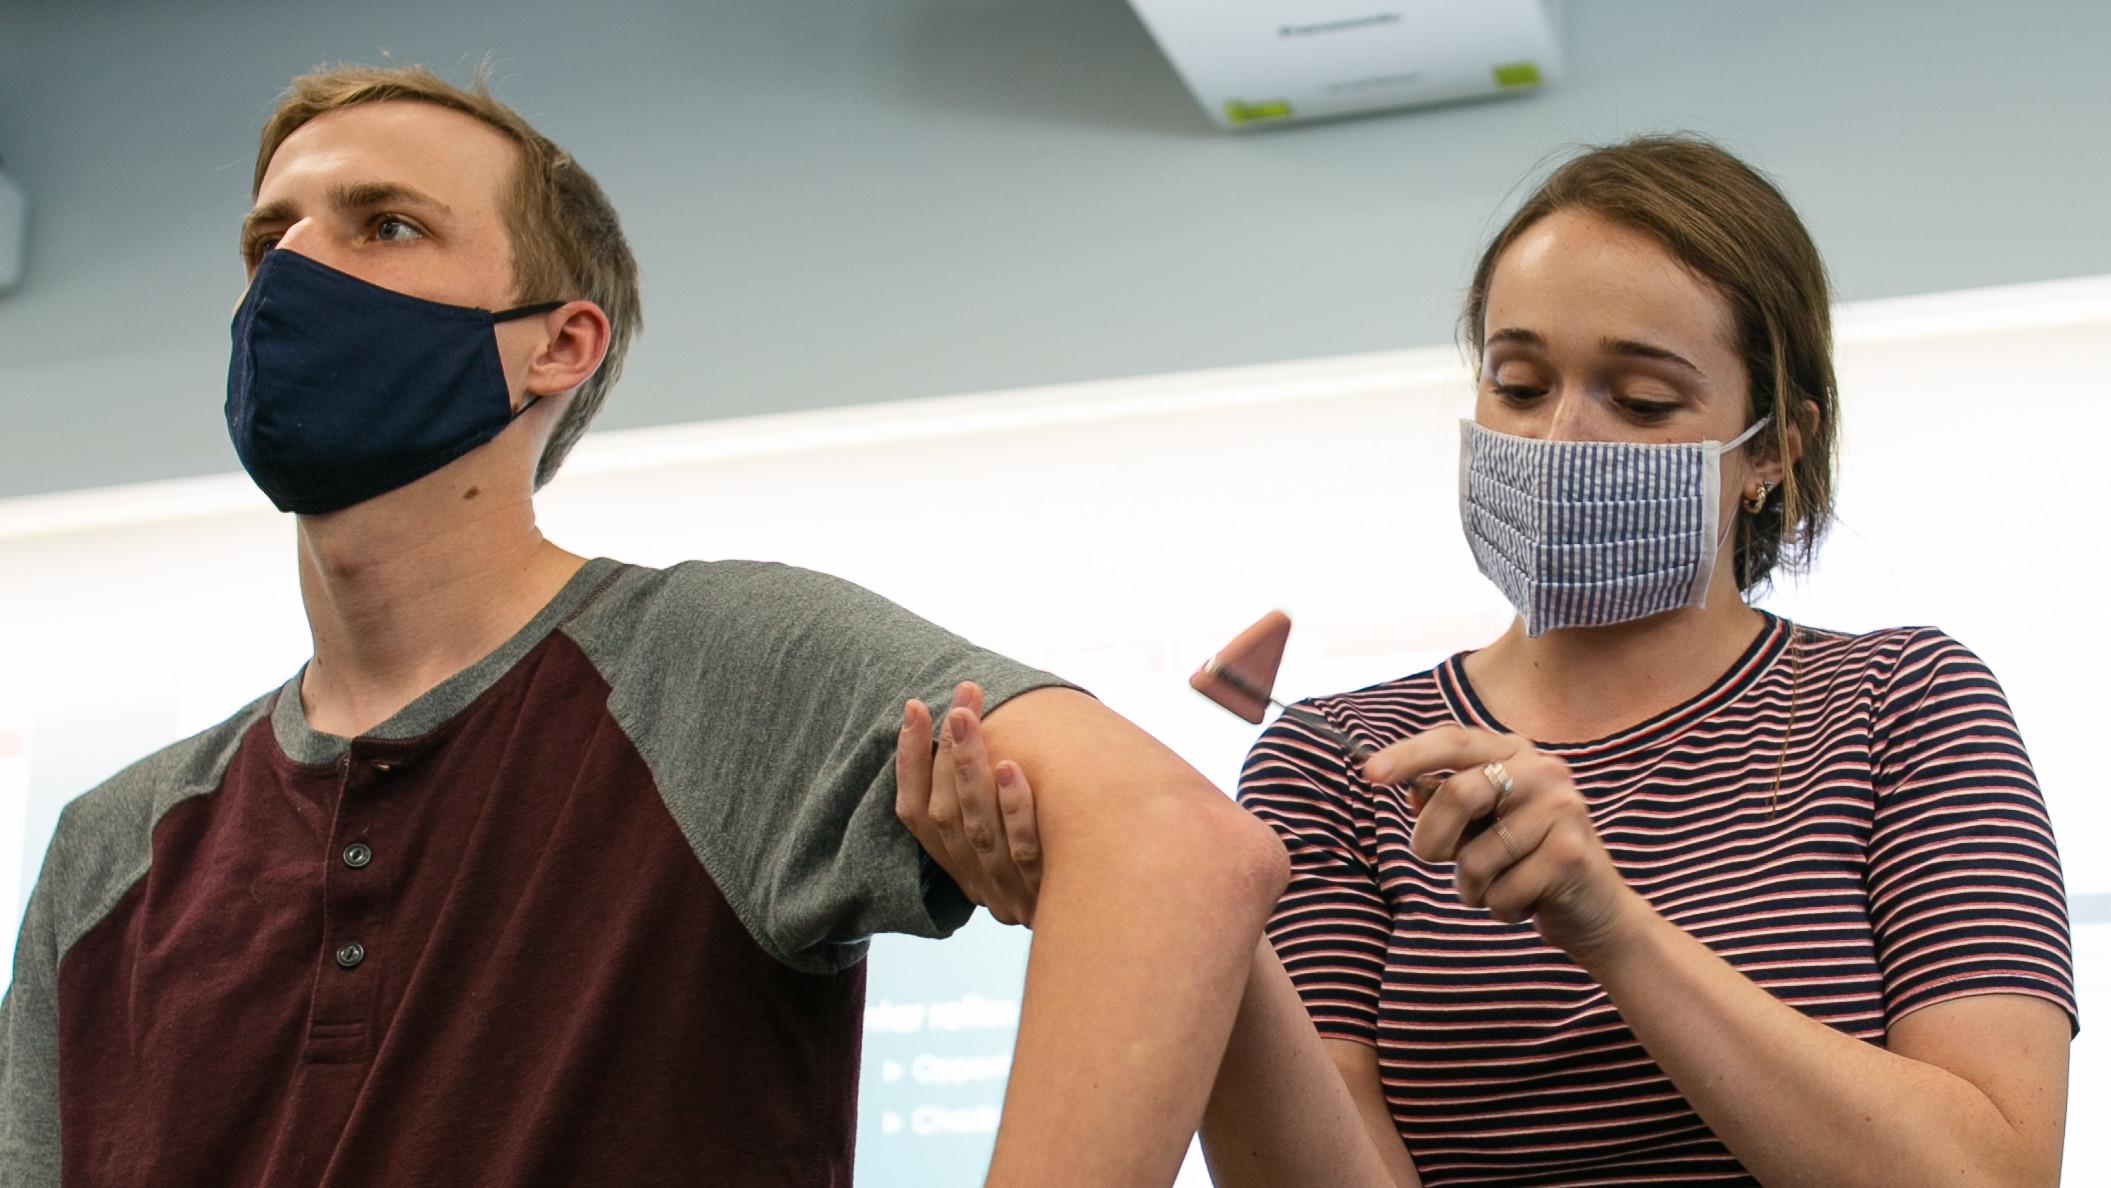 Idaho WWAMI students learning clinical skills